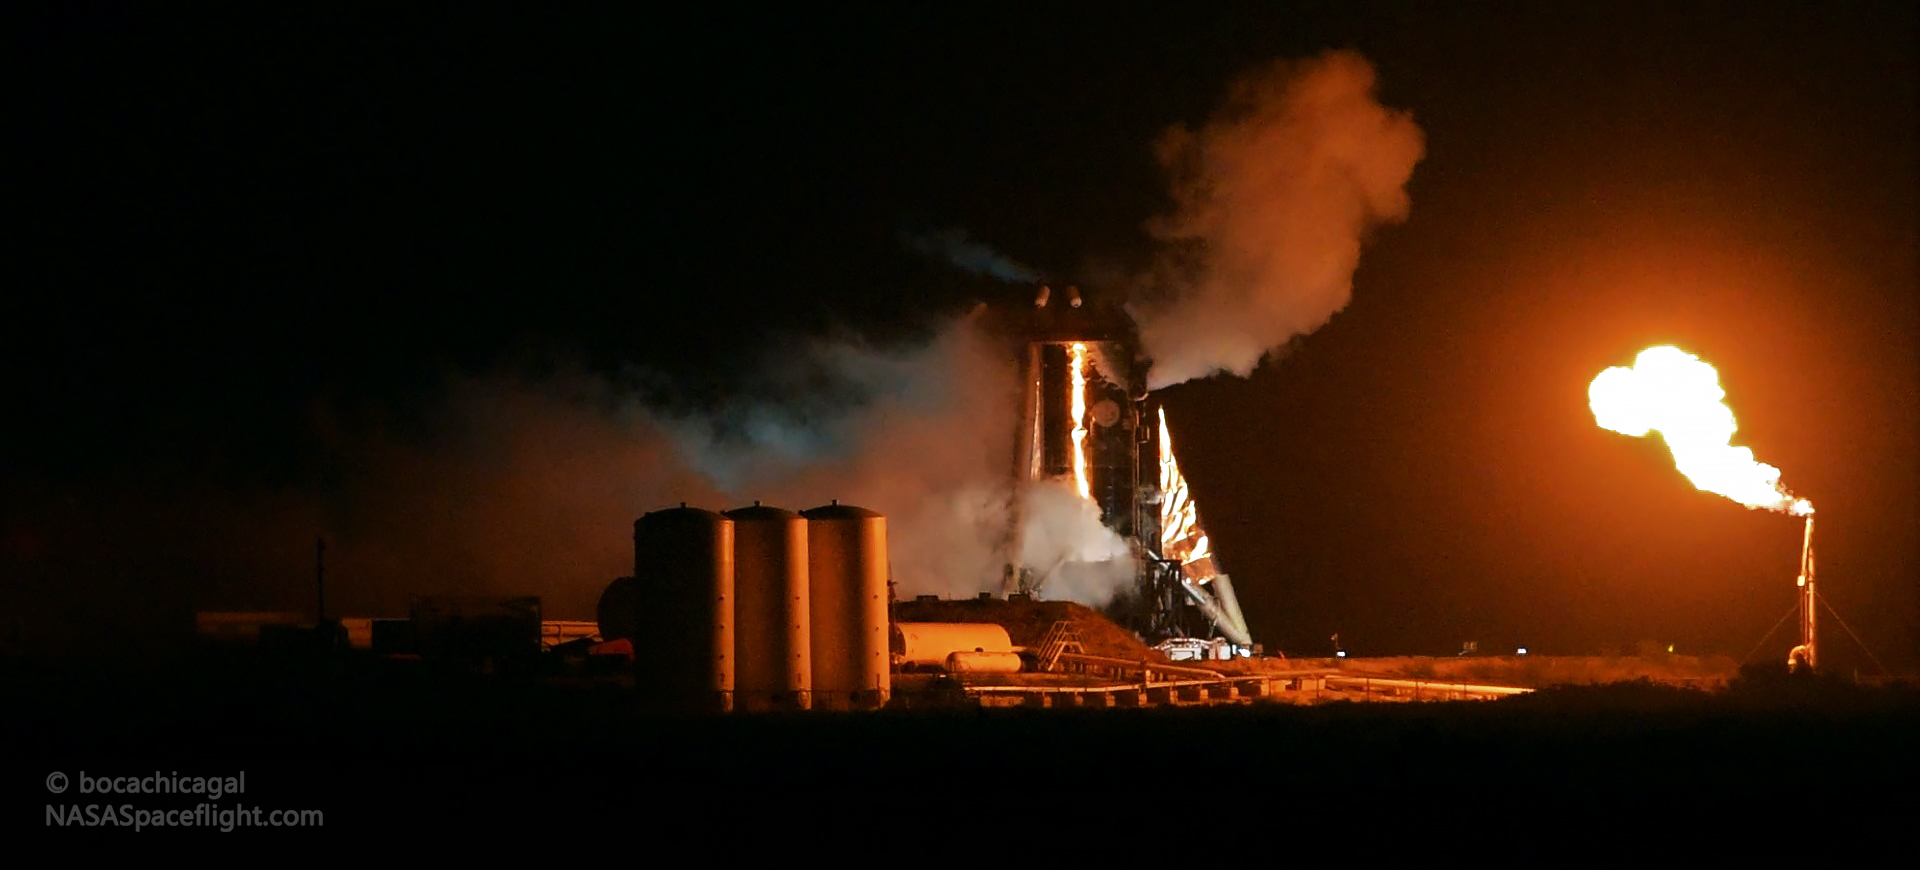 Starhopper Raptor SN06 preburner static fire 071519 (NASASpaceflight – bocachicagal) 2